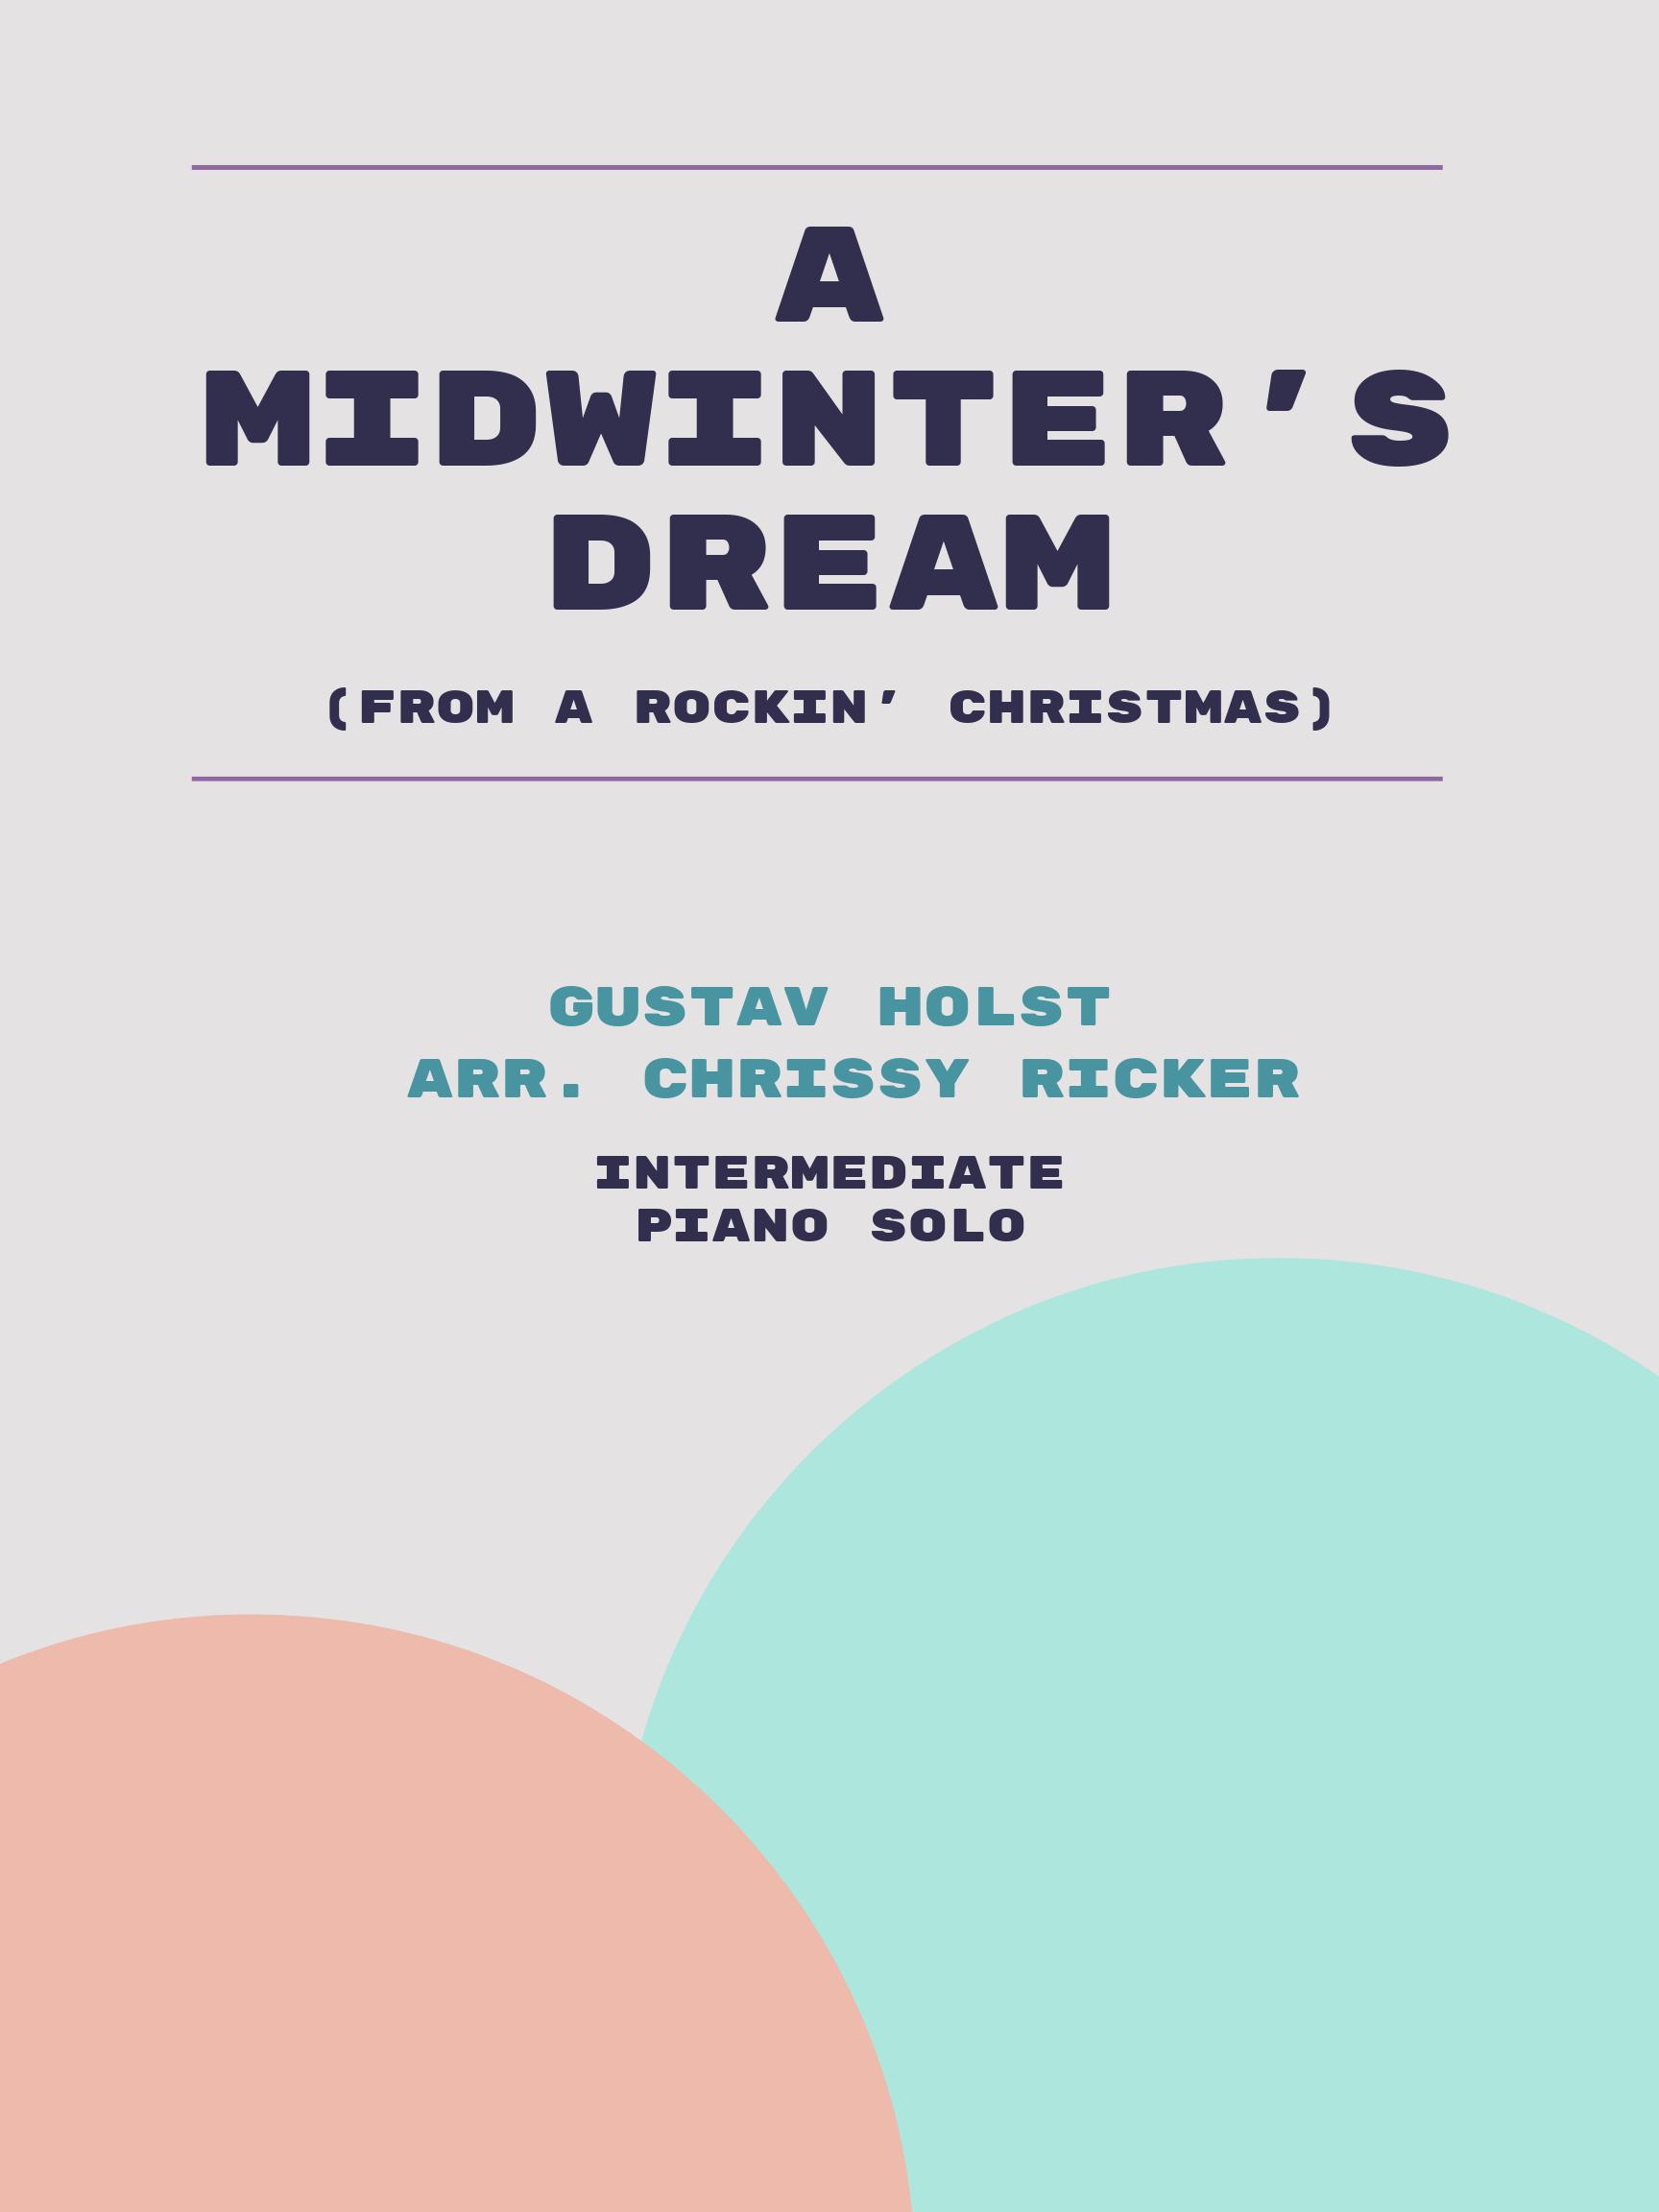 A Midwinter's Dream by Gustav Holst